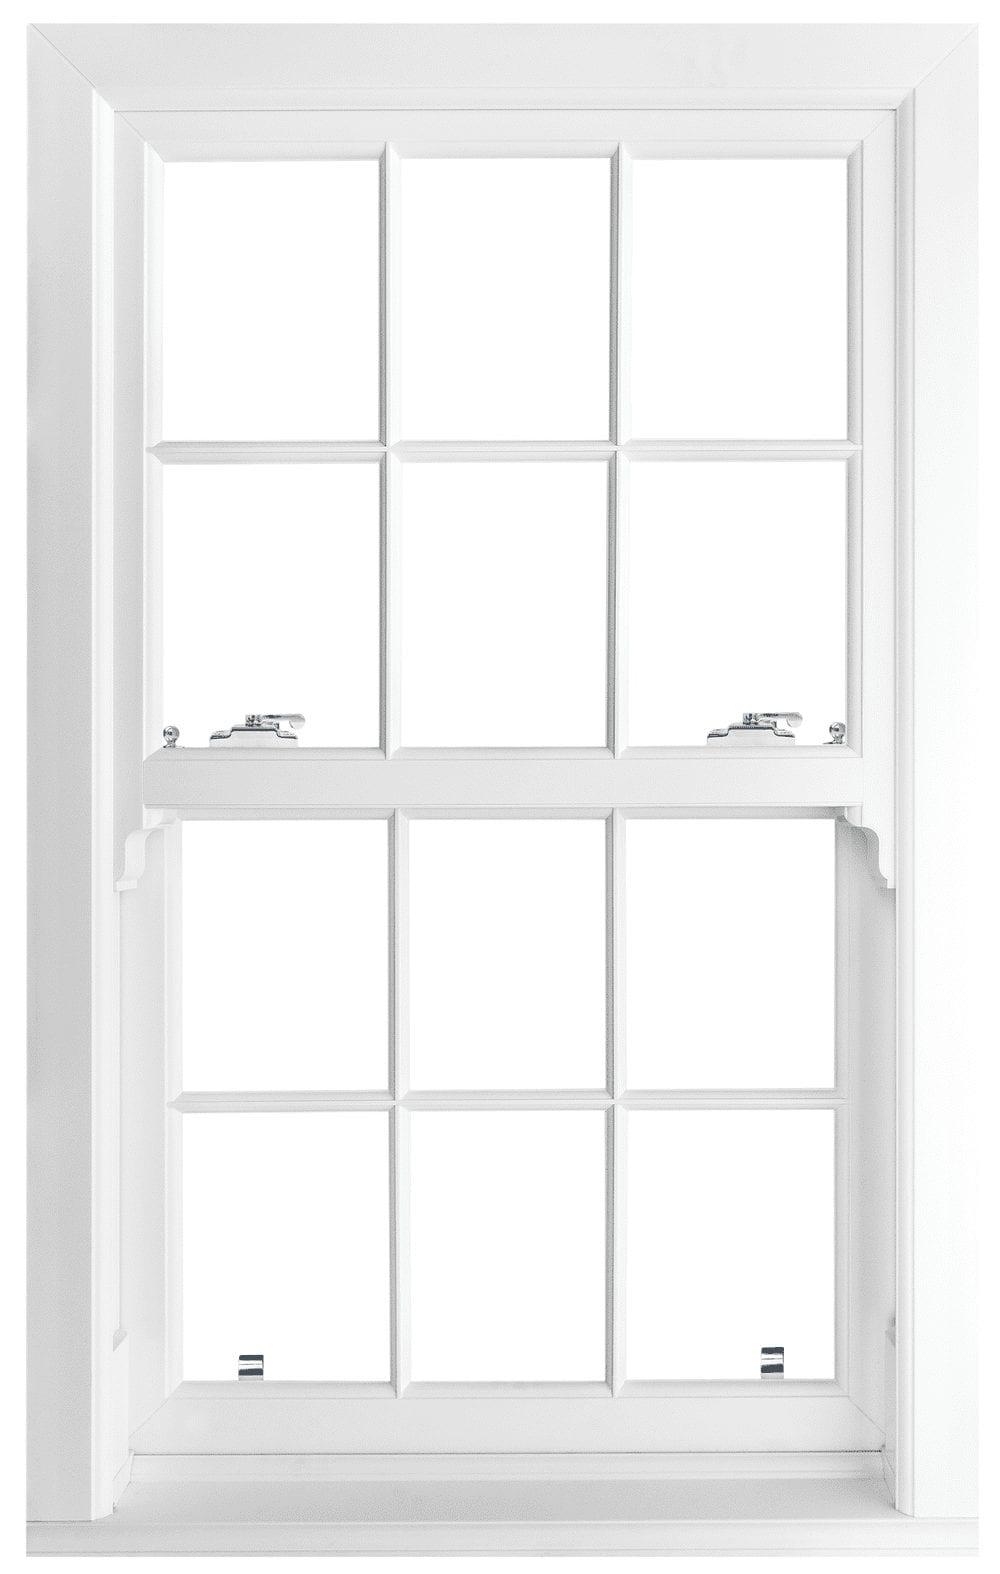 Vertical Sliding Windows Sash Windows Georgian windows online design and ordering tool, ireland